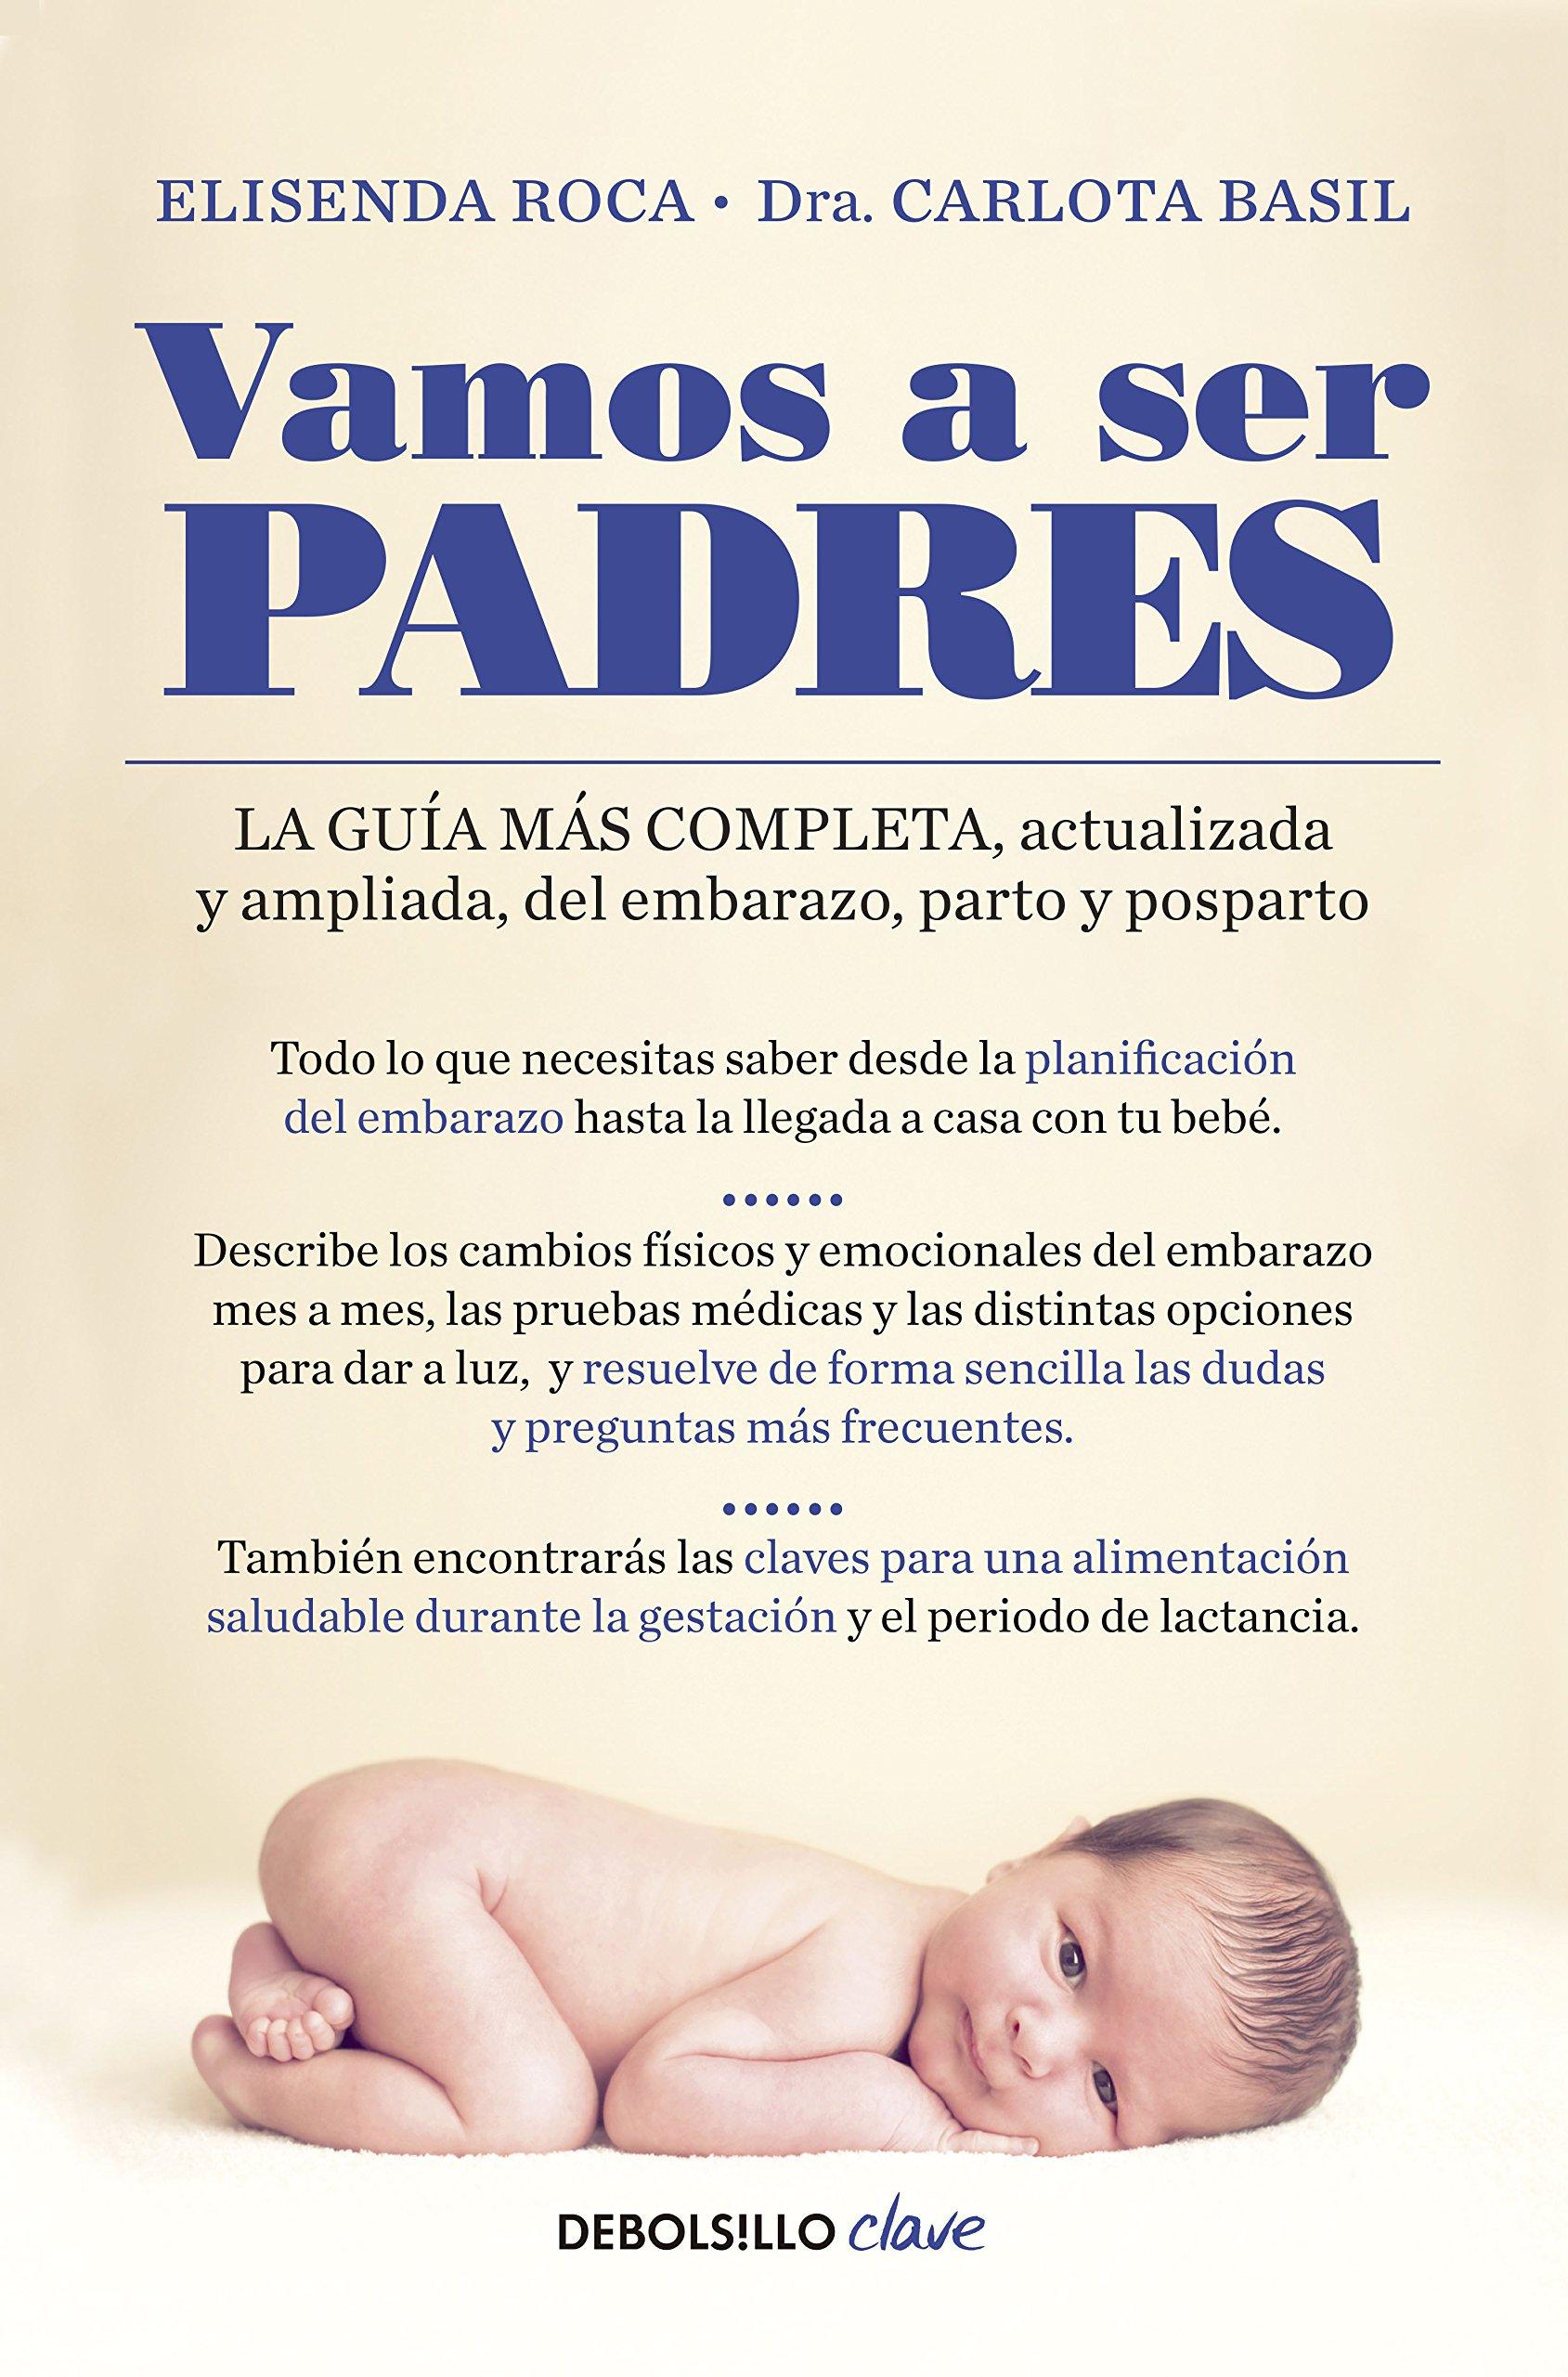 VAMOS A SER PADRES: ELISENDA / BASIL, CARLOTA ROCA: 9786073168847: Amazon.com: Books